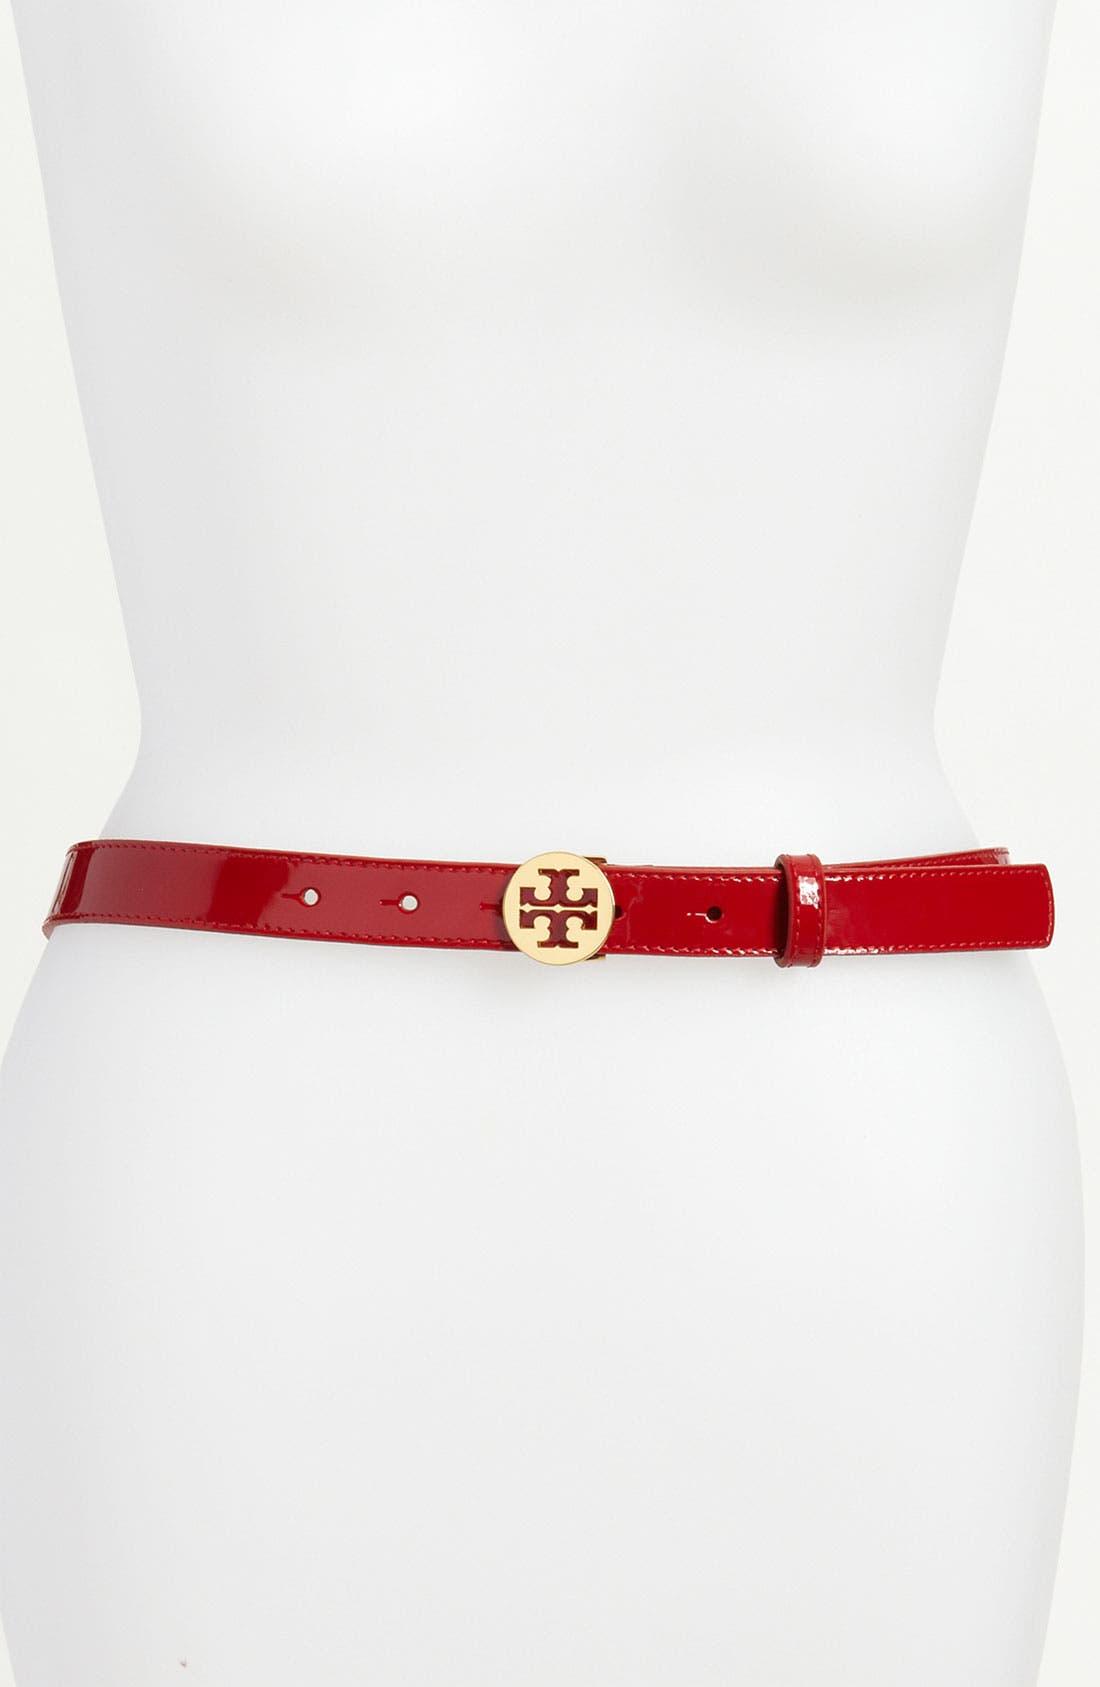 Main Image - Tory Burch 'Logo' Patent Leather Belt